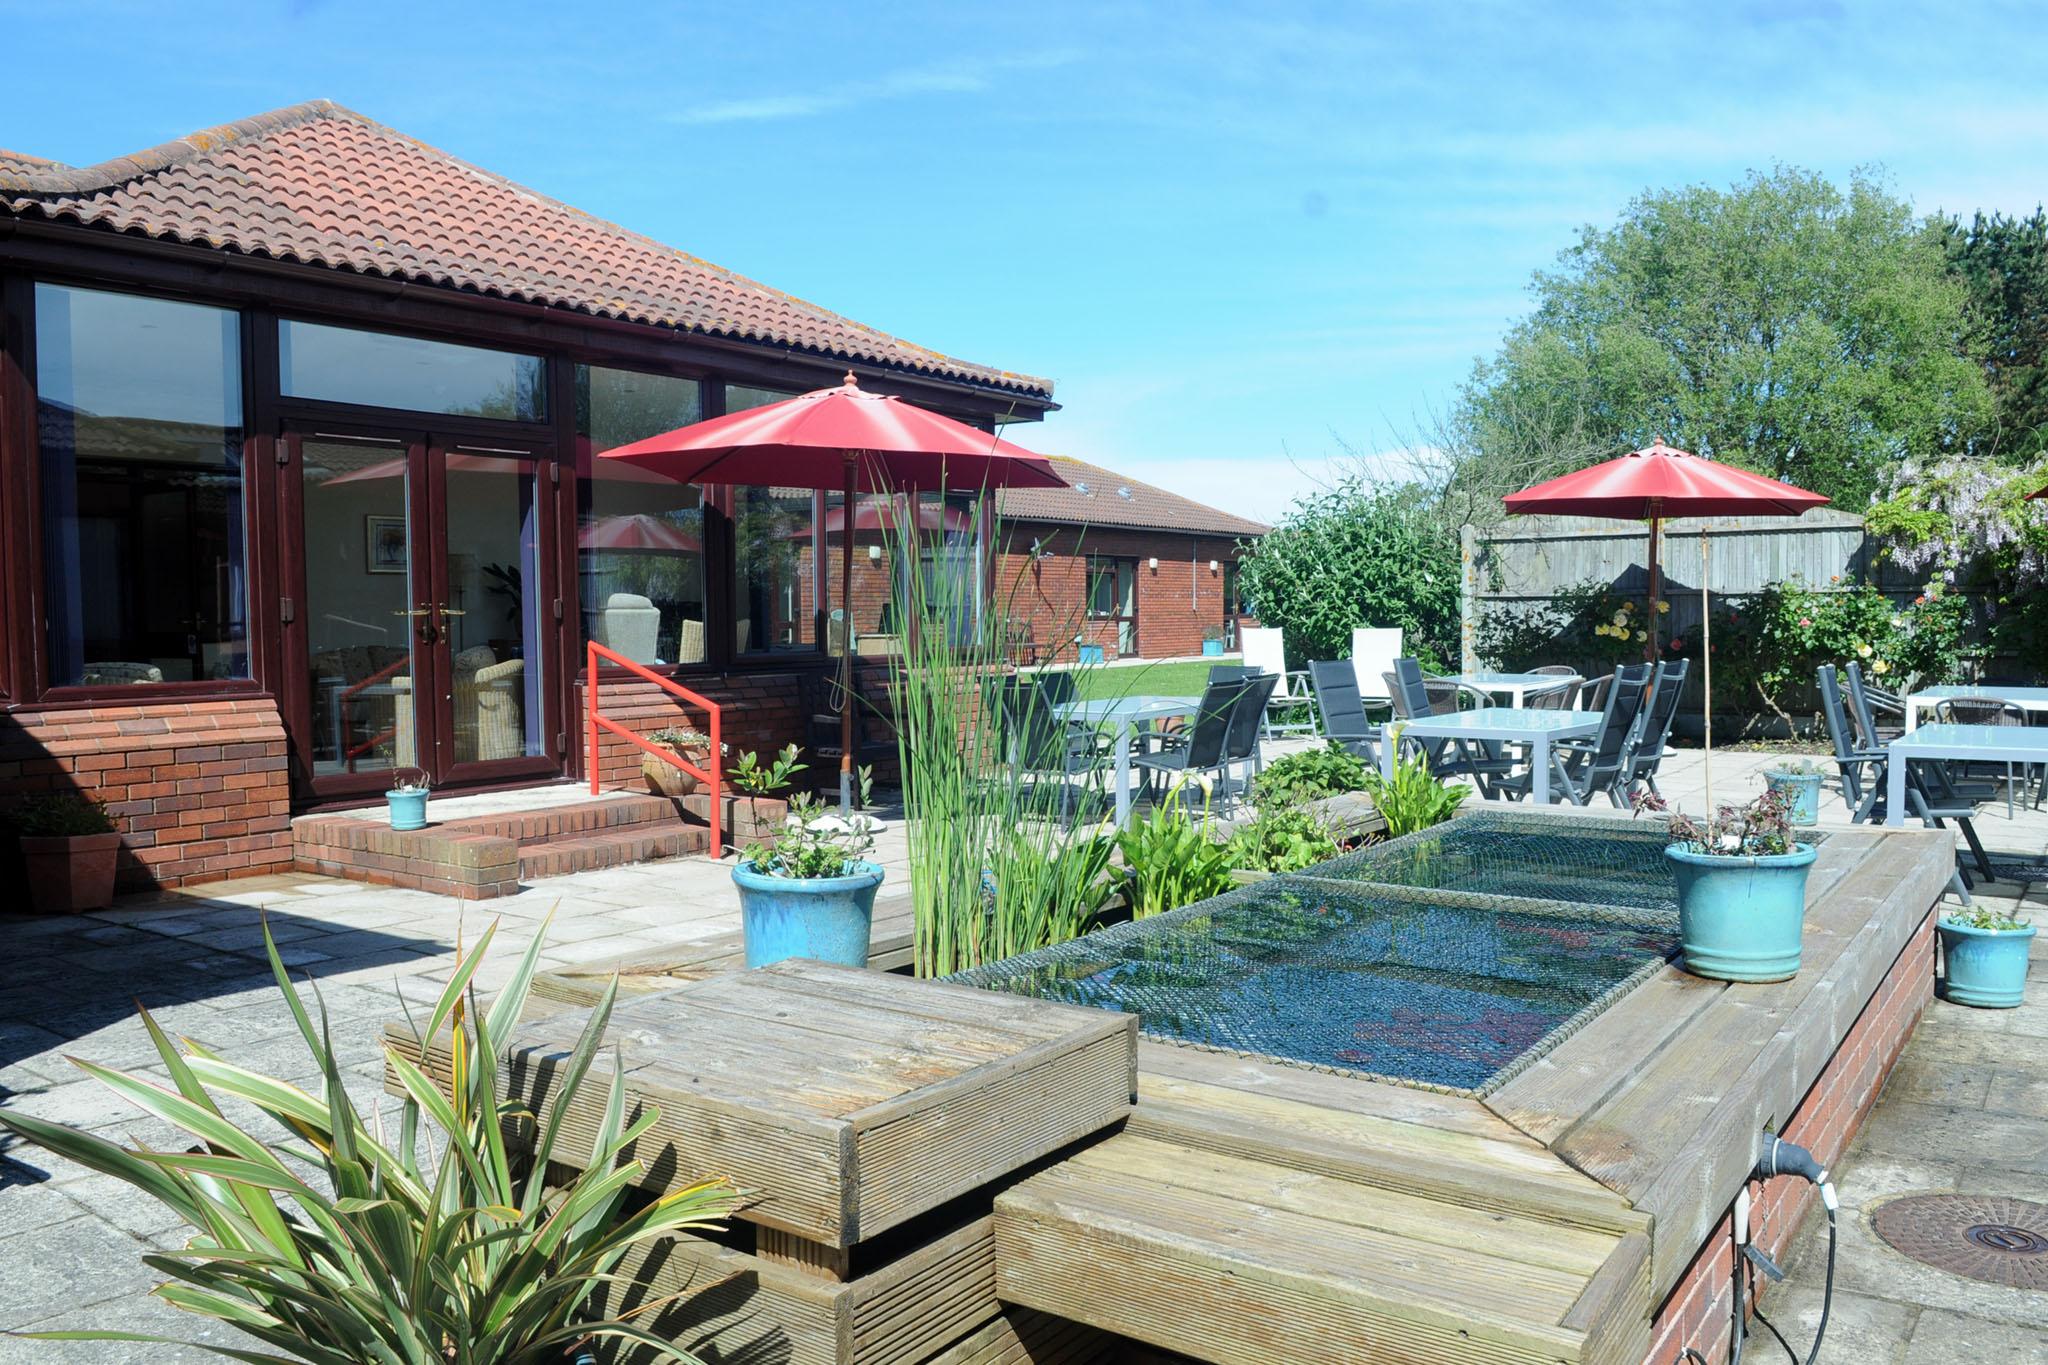 Manorfield Residential Home Garden Pond